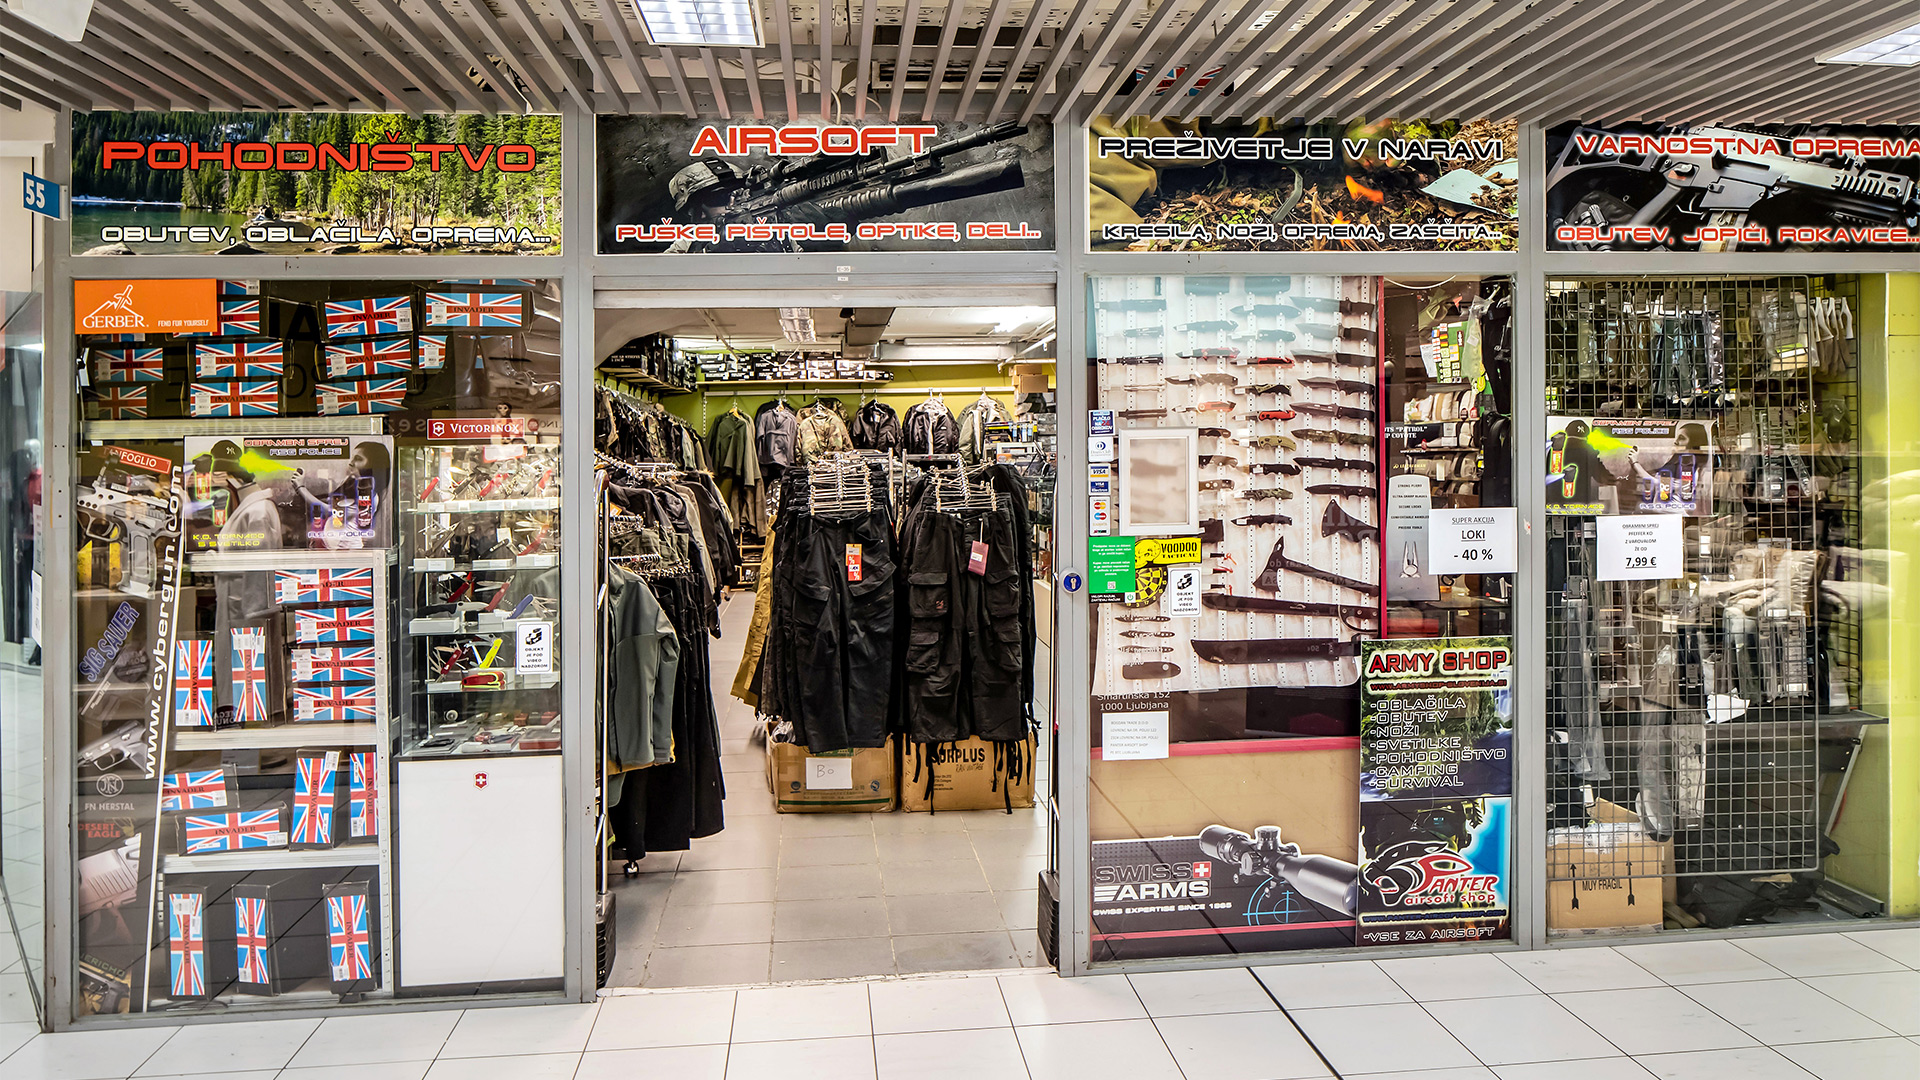 Panter Army Shop